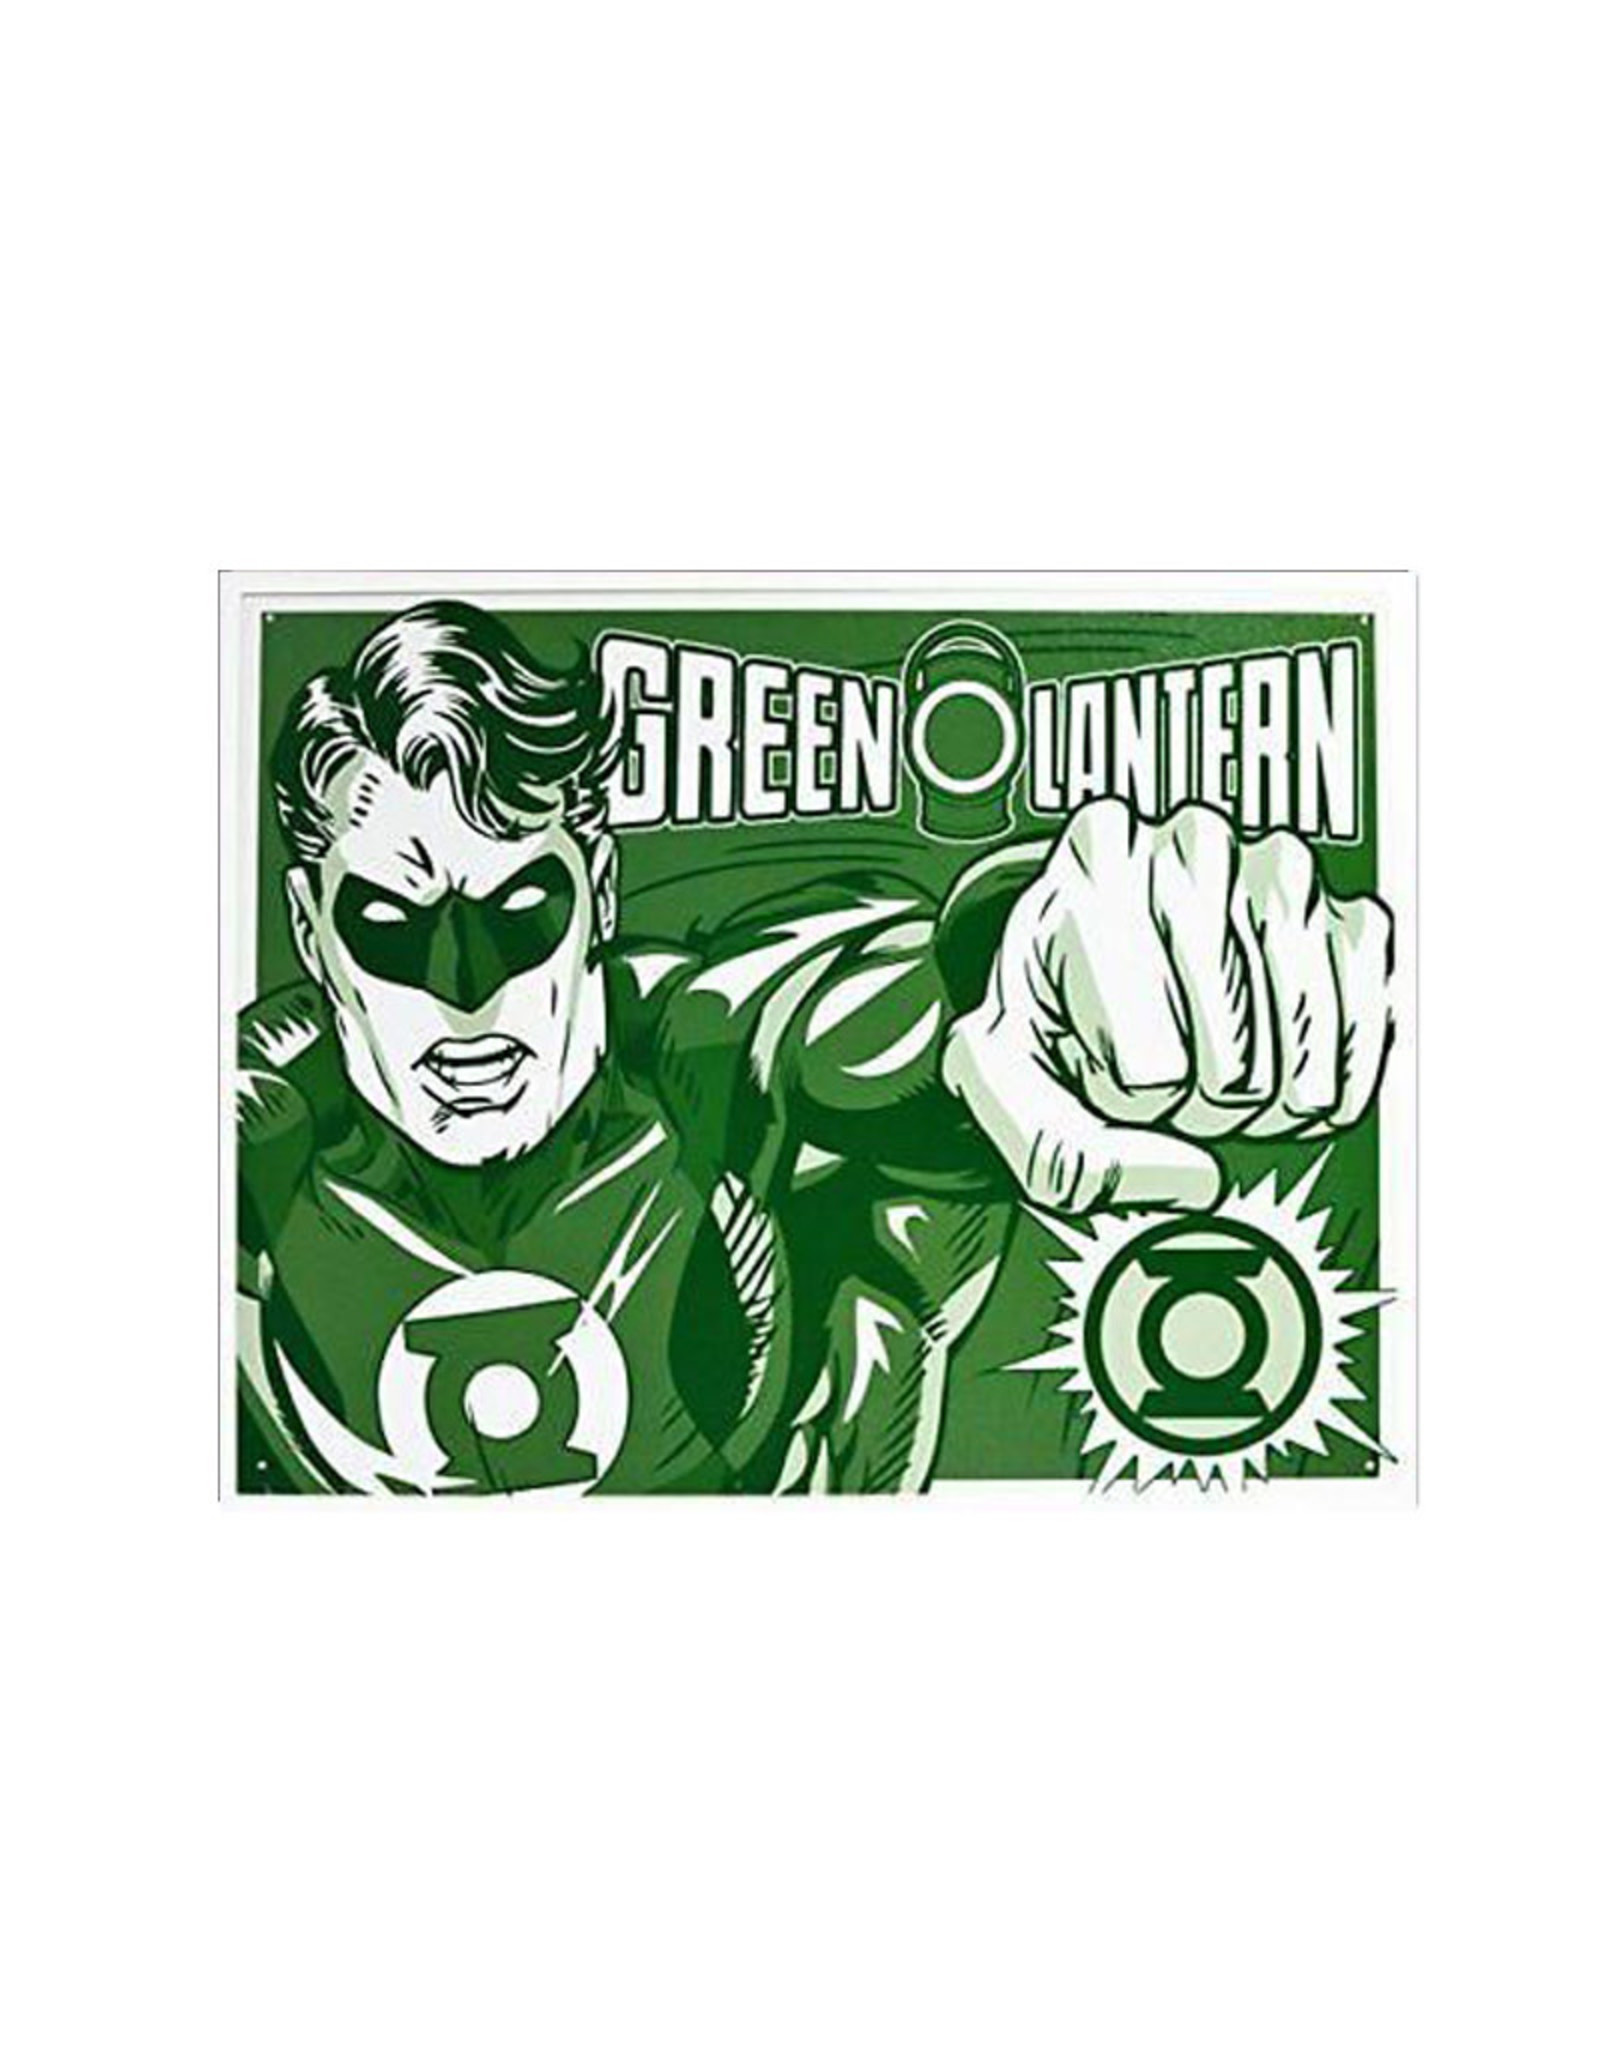 Dc comics Dc Comics ( Metal Sign 12.5 X 16 ) Green Lantern